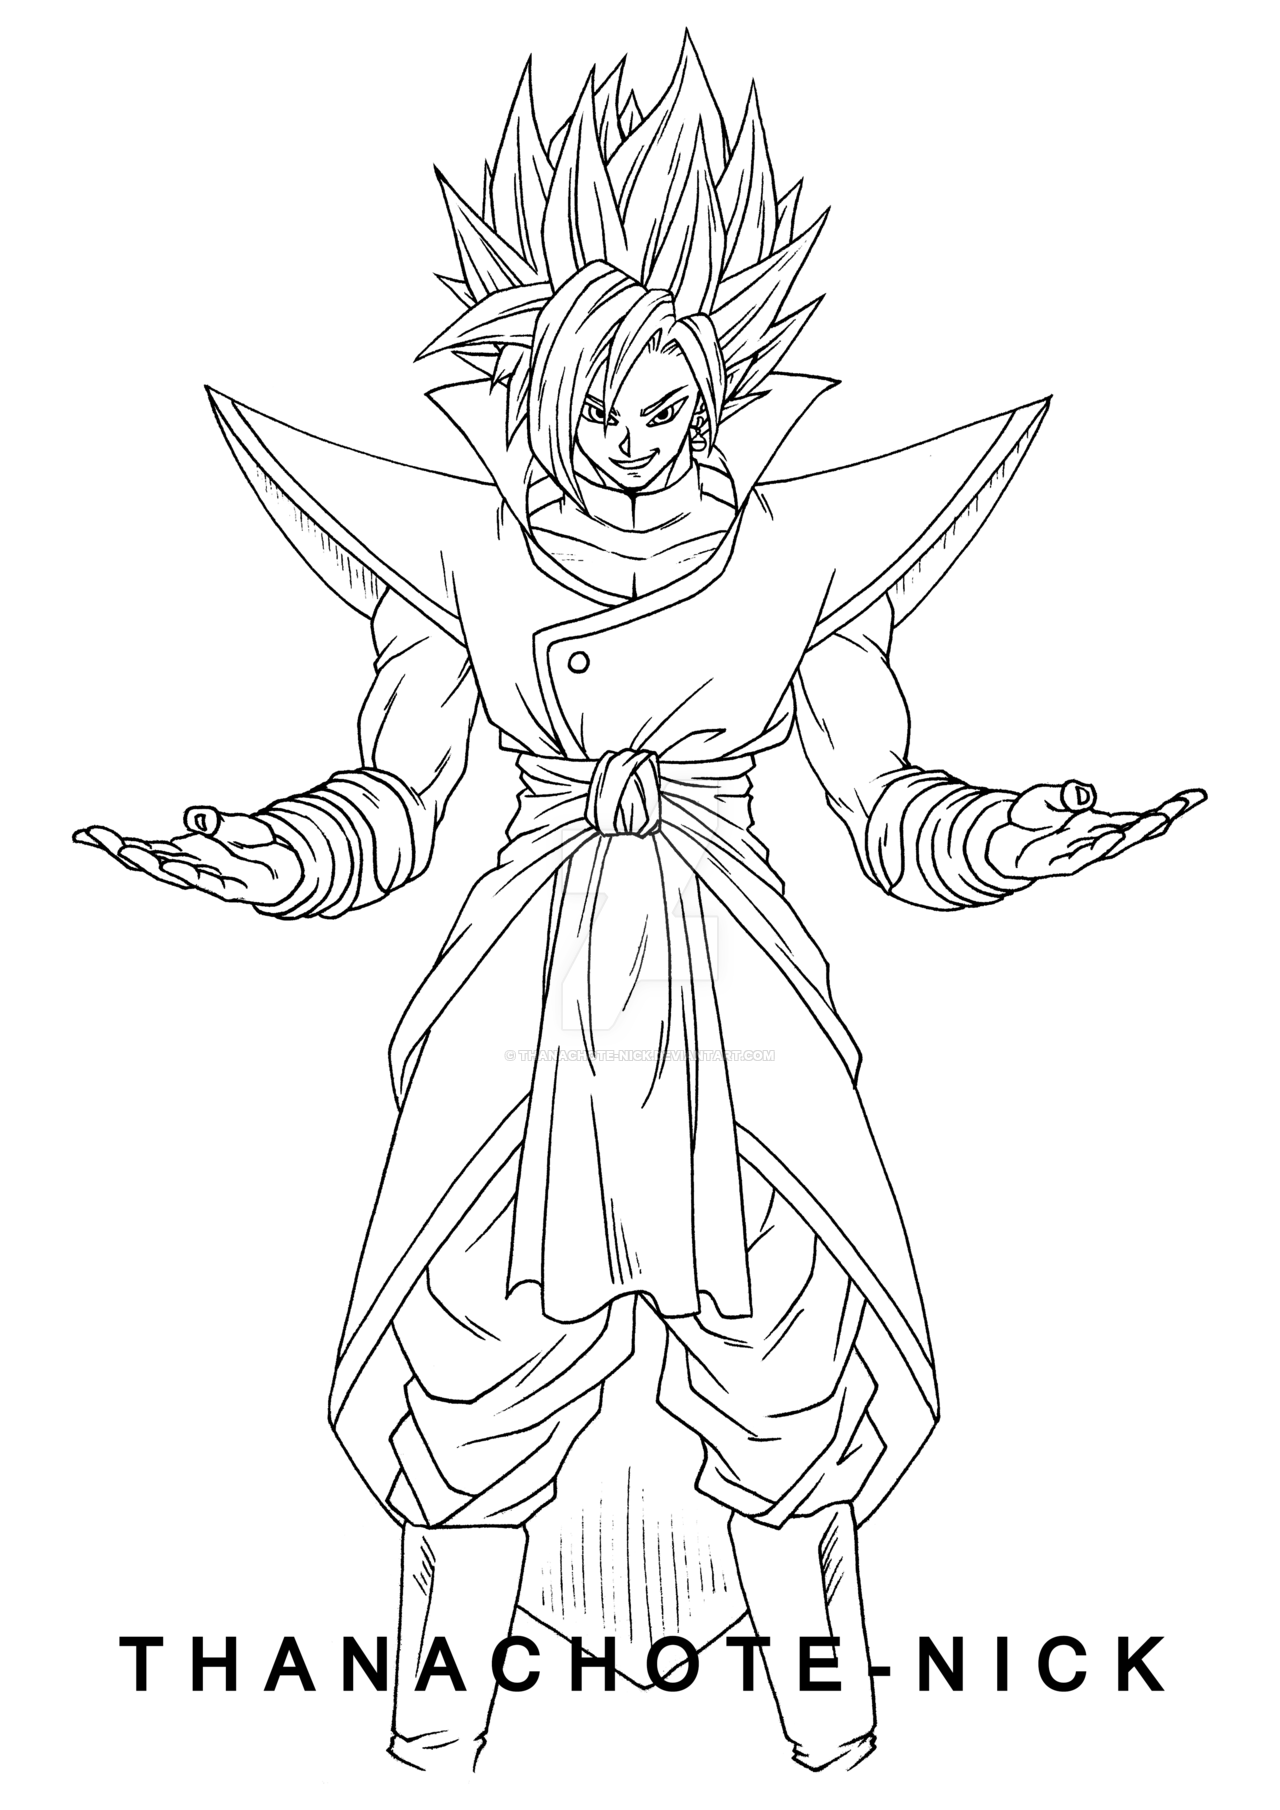 Saga dragon ball epic characters dbz son goku deviantart fan art